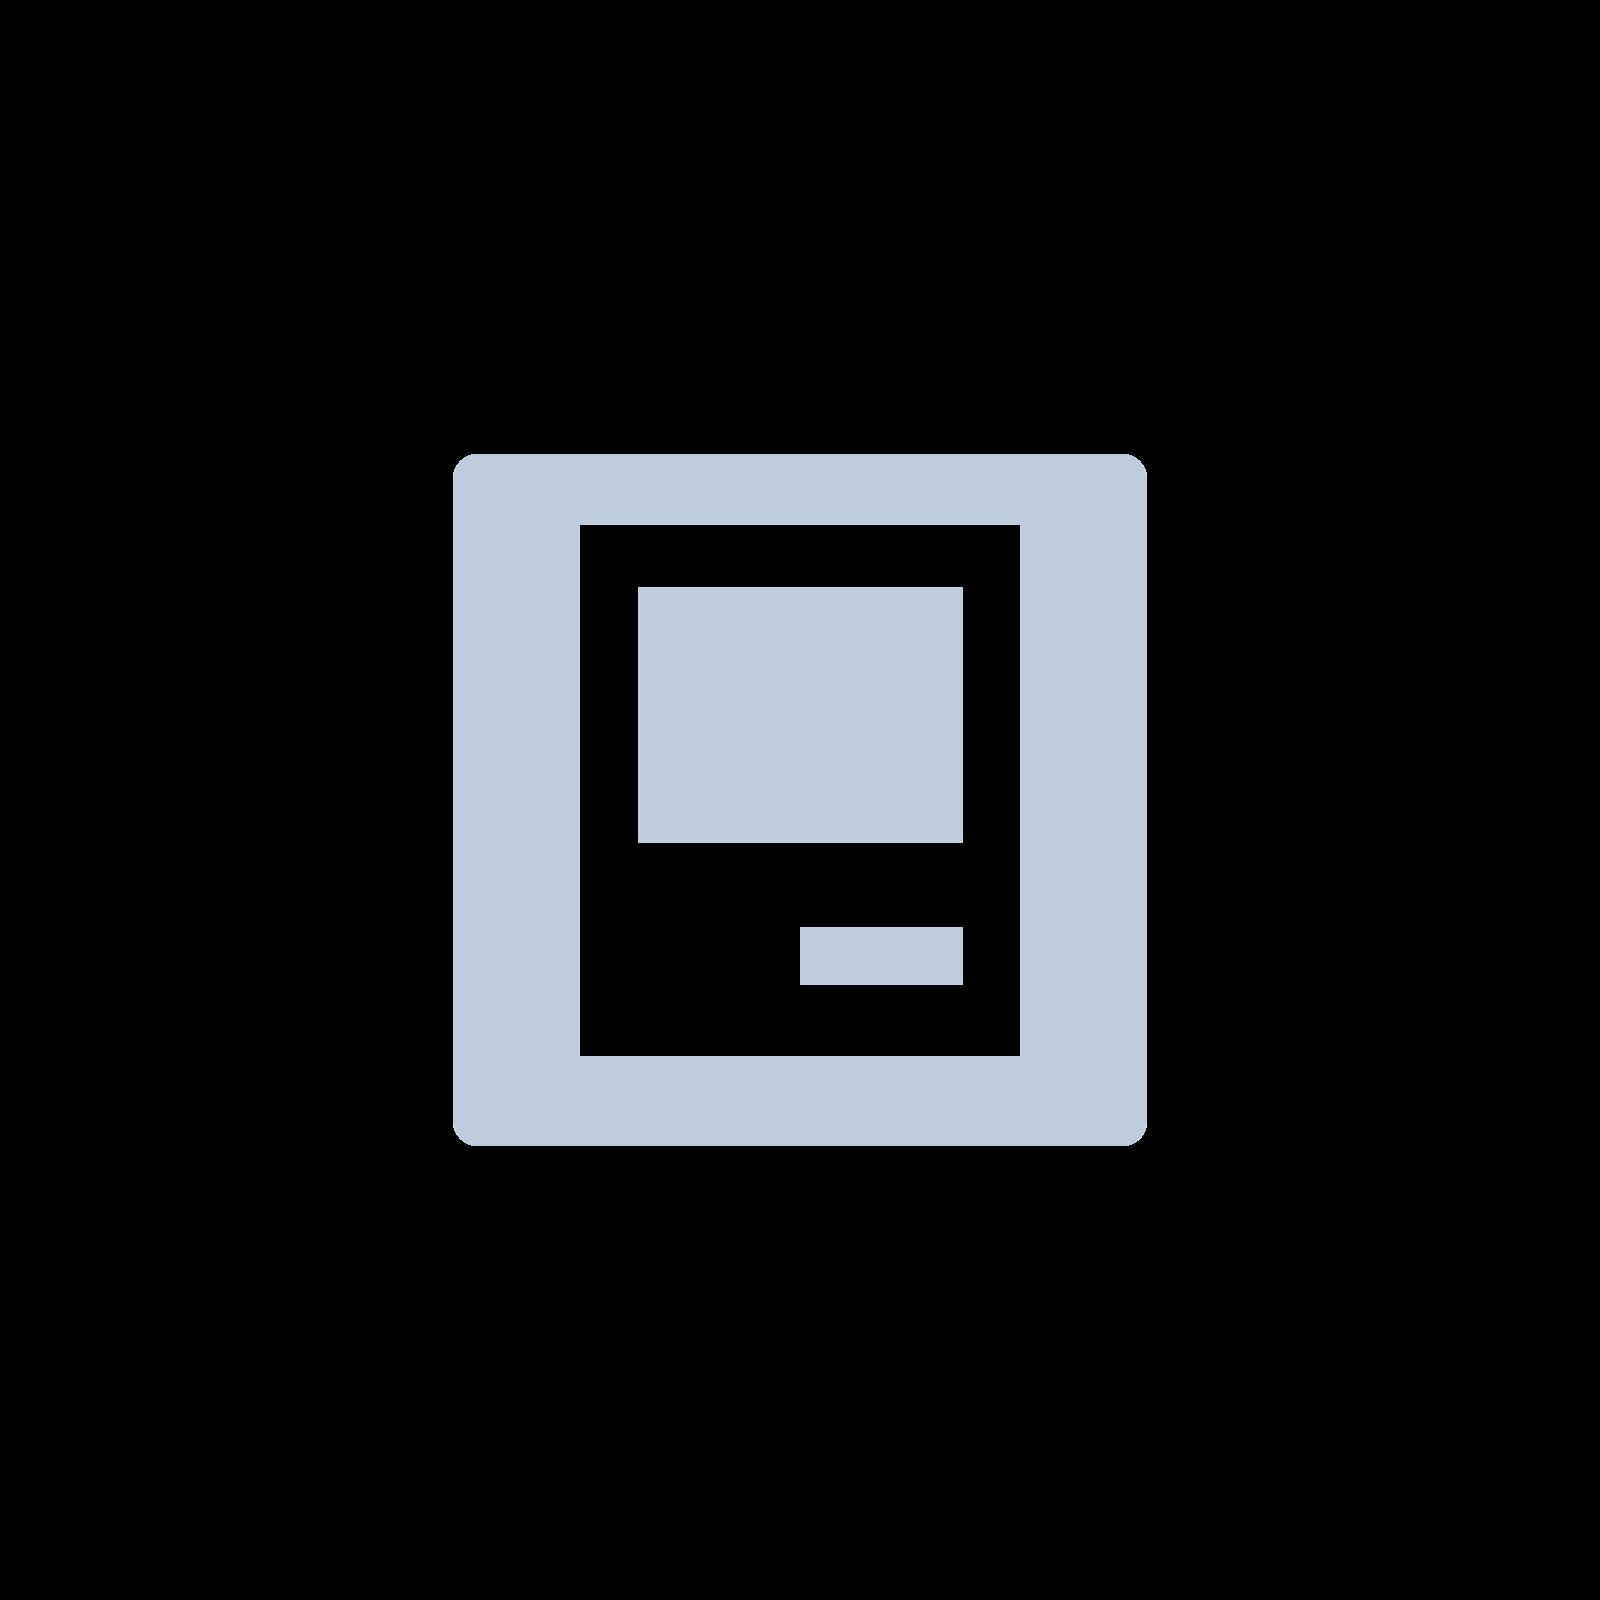 Mac mini Core 2 Duo 2.4GHz (MacMini4,1, 320GB, 2GB)